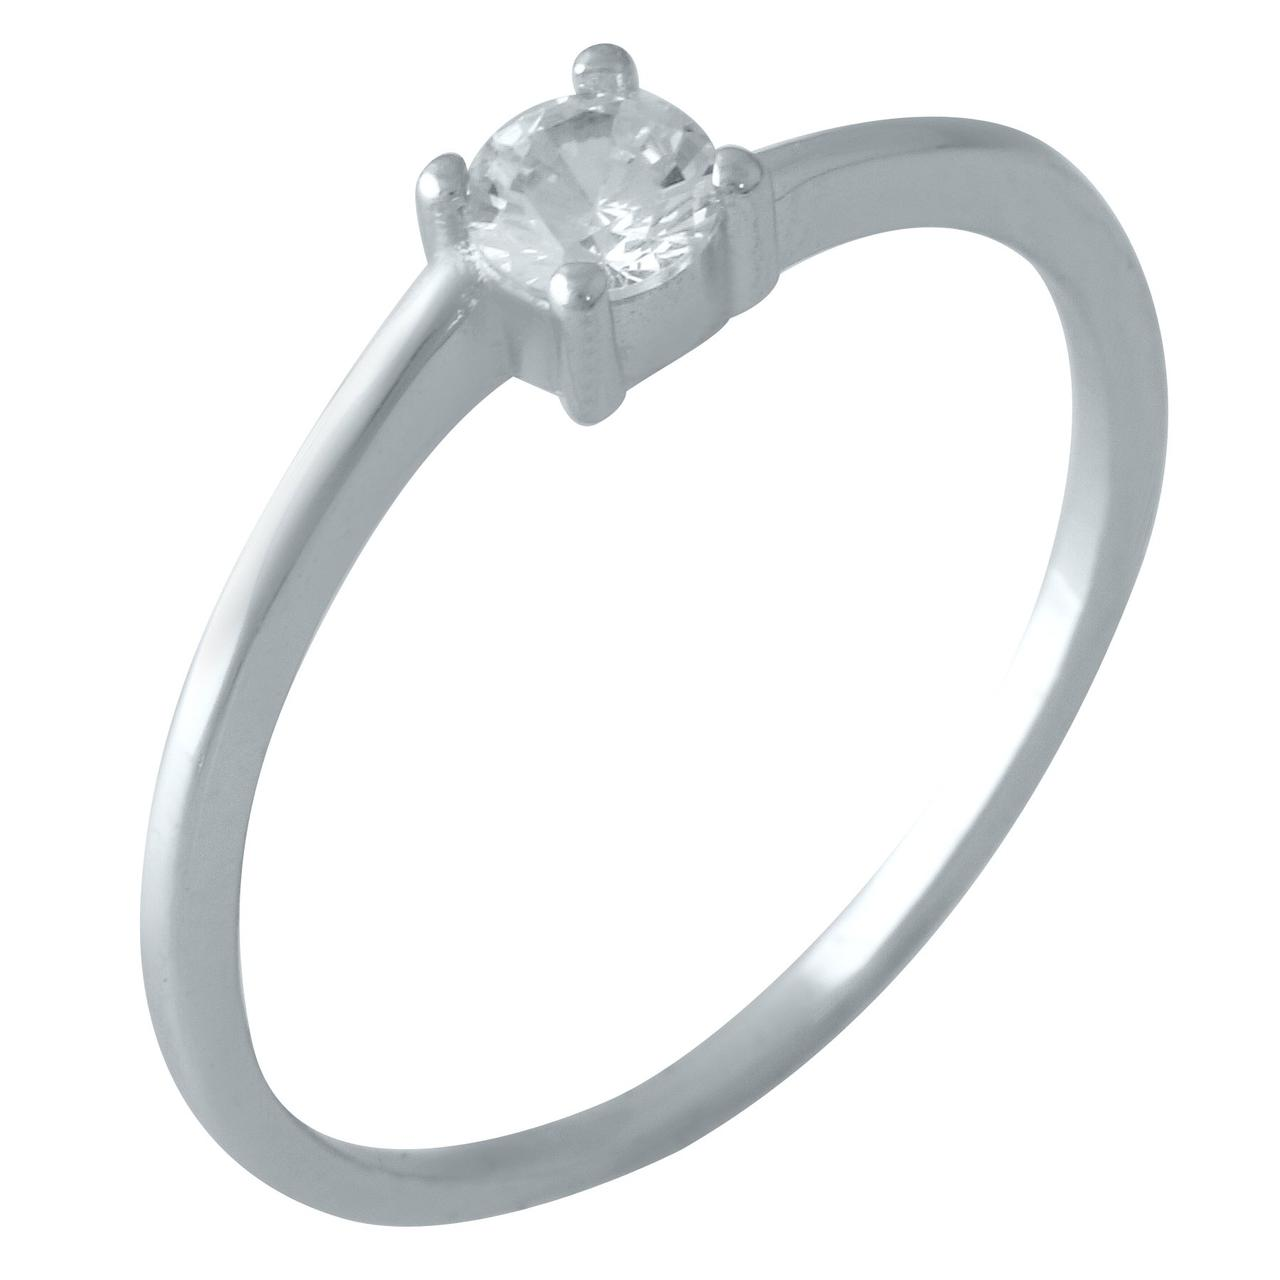 Серебряное кольцо DreamJewelry с фианитами (1920015) 18 размер